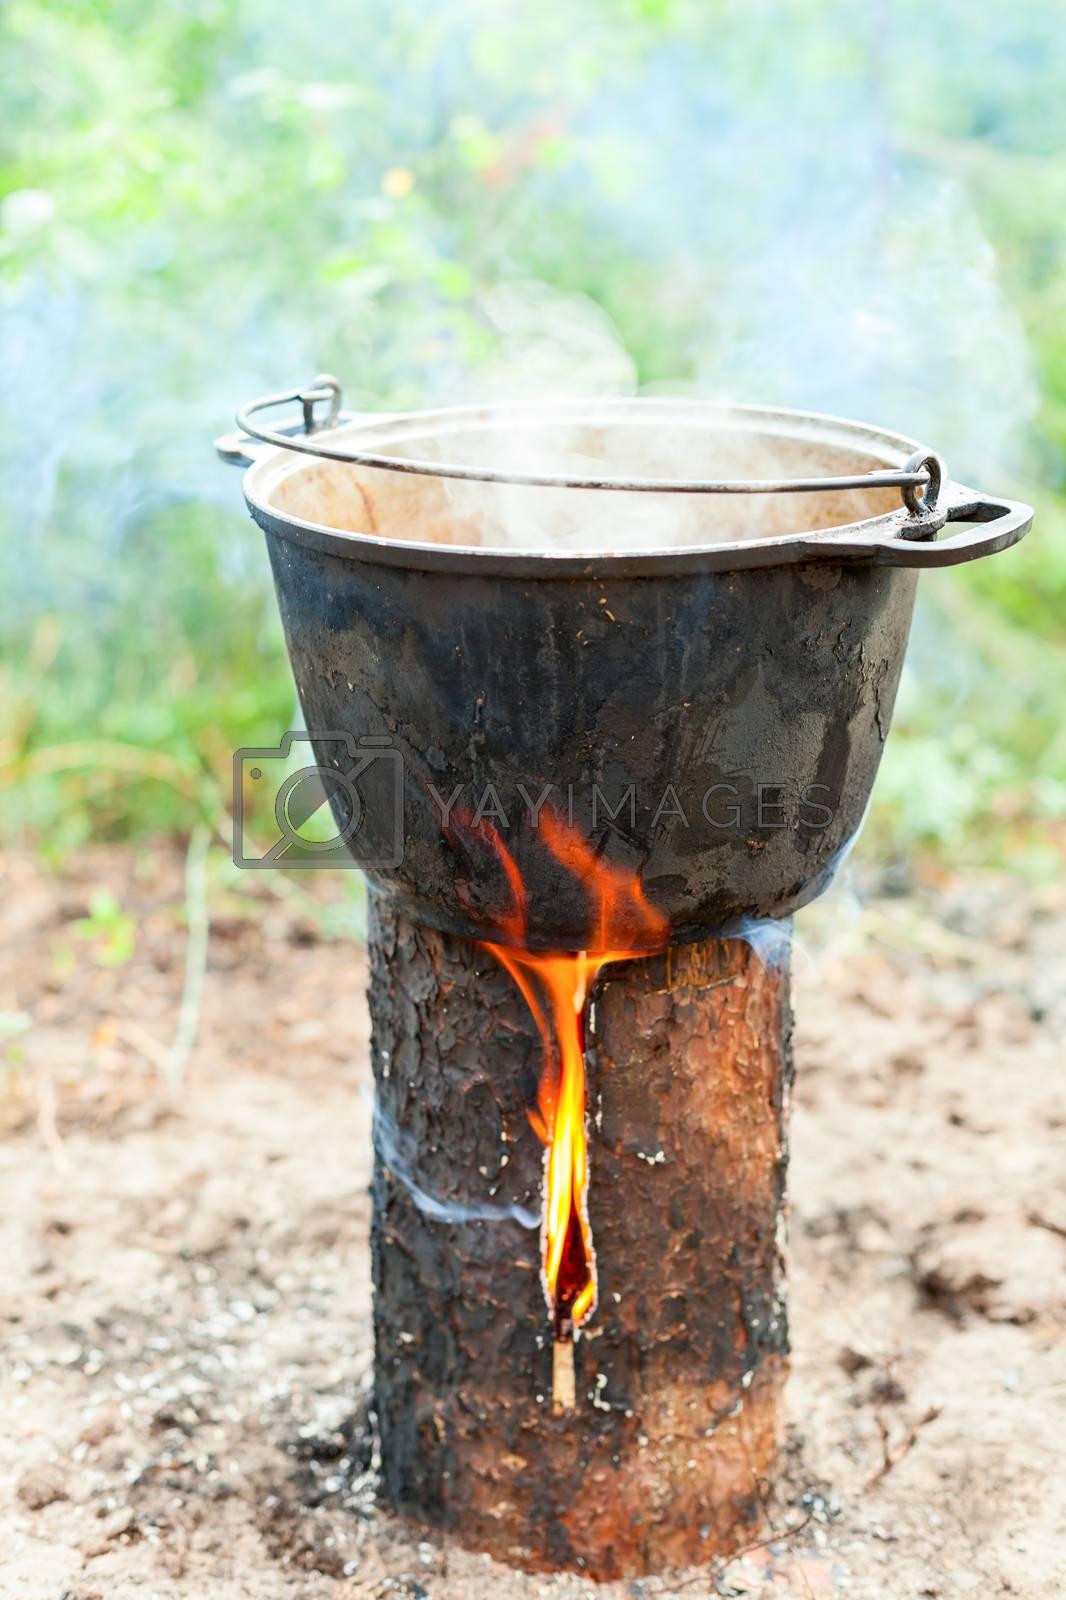 Cooking Goulash soup in cauldron on Finnish (Swedish) log stove